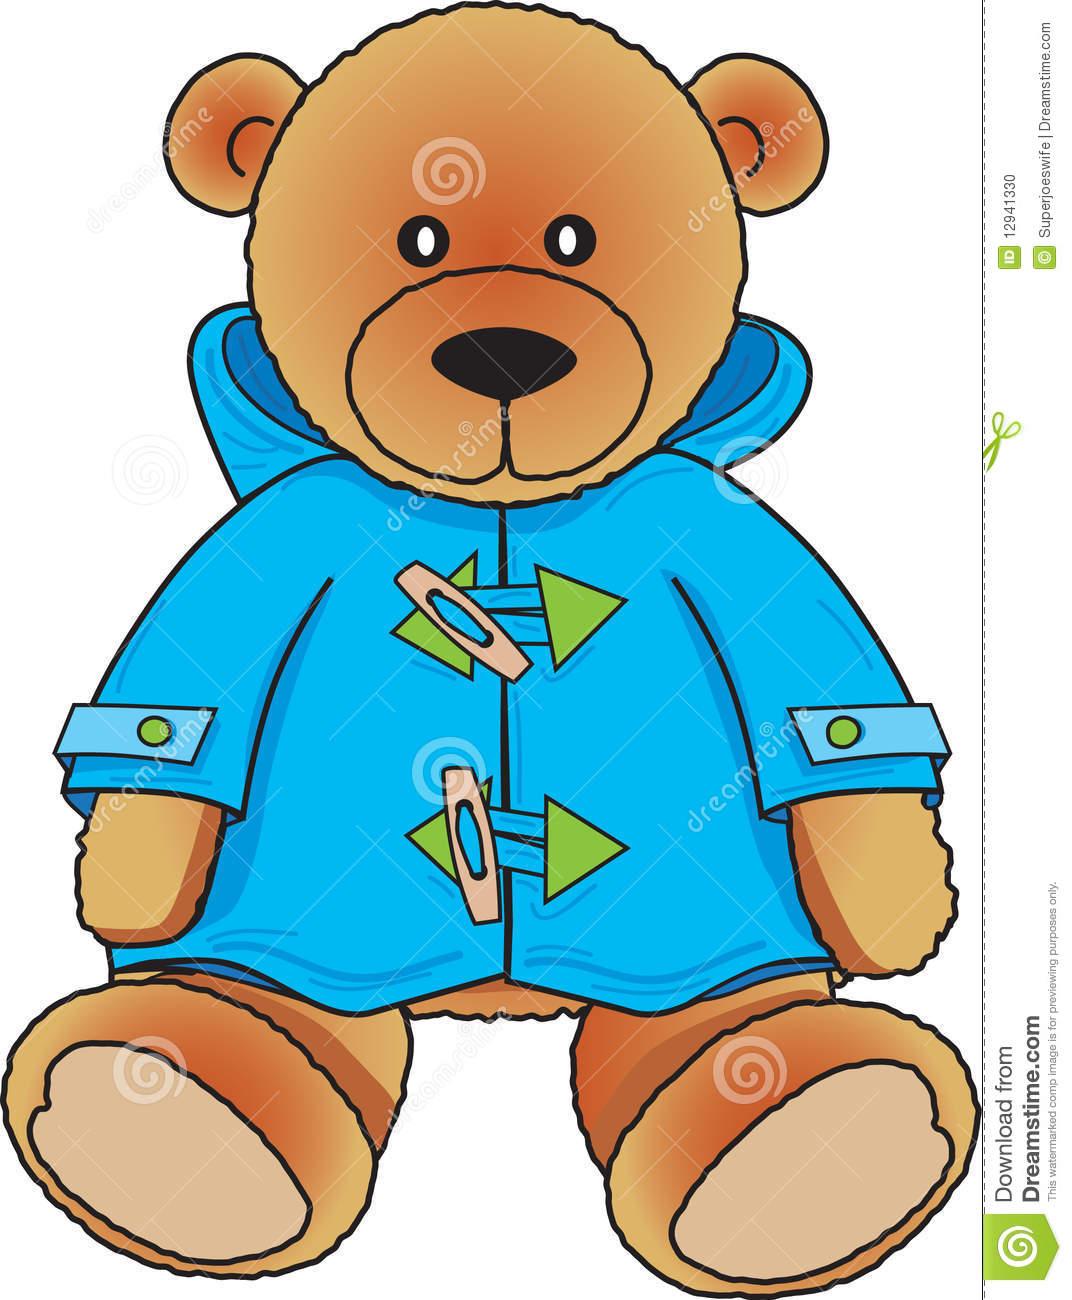 1072x1300 Cute Colors Clipart Stock Photo Teddy Bear In Blue Coat Cute